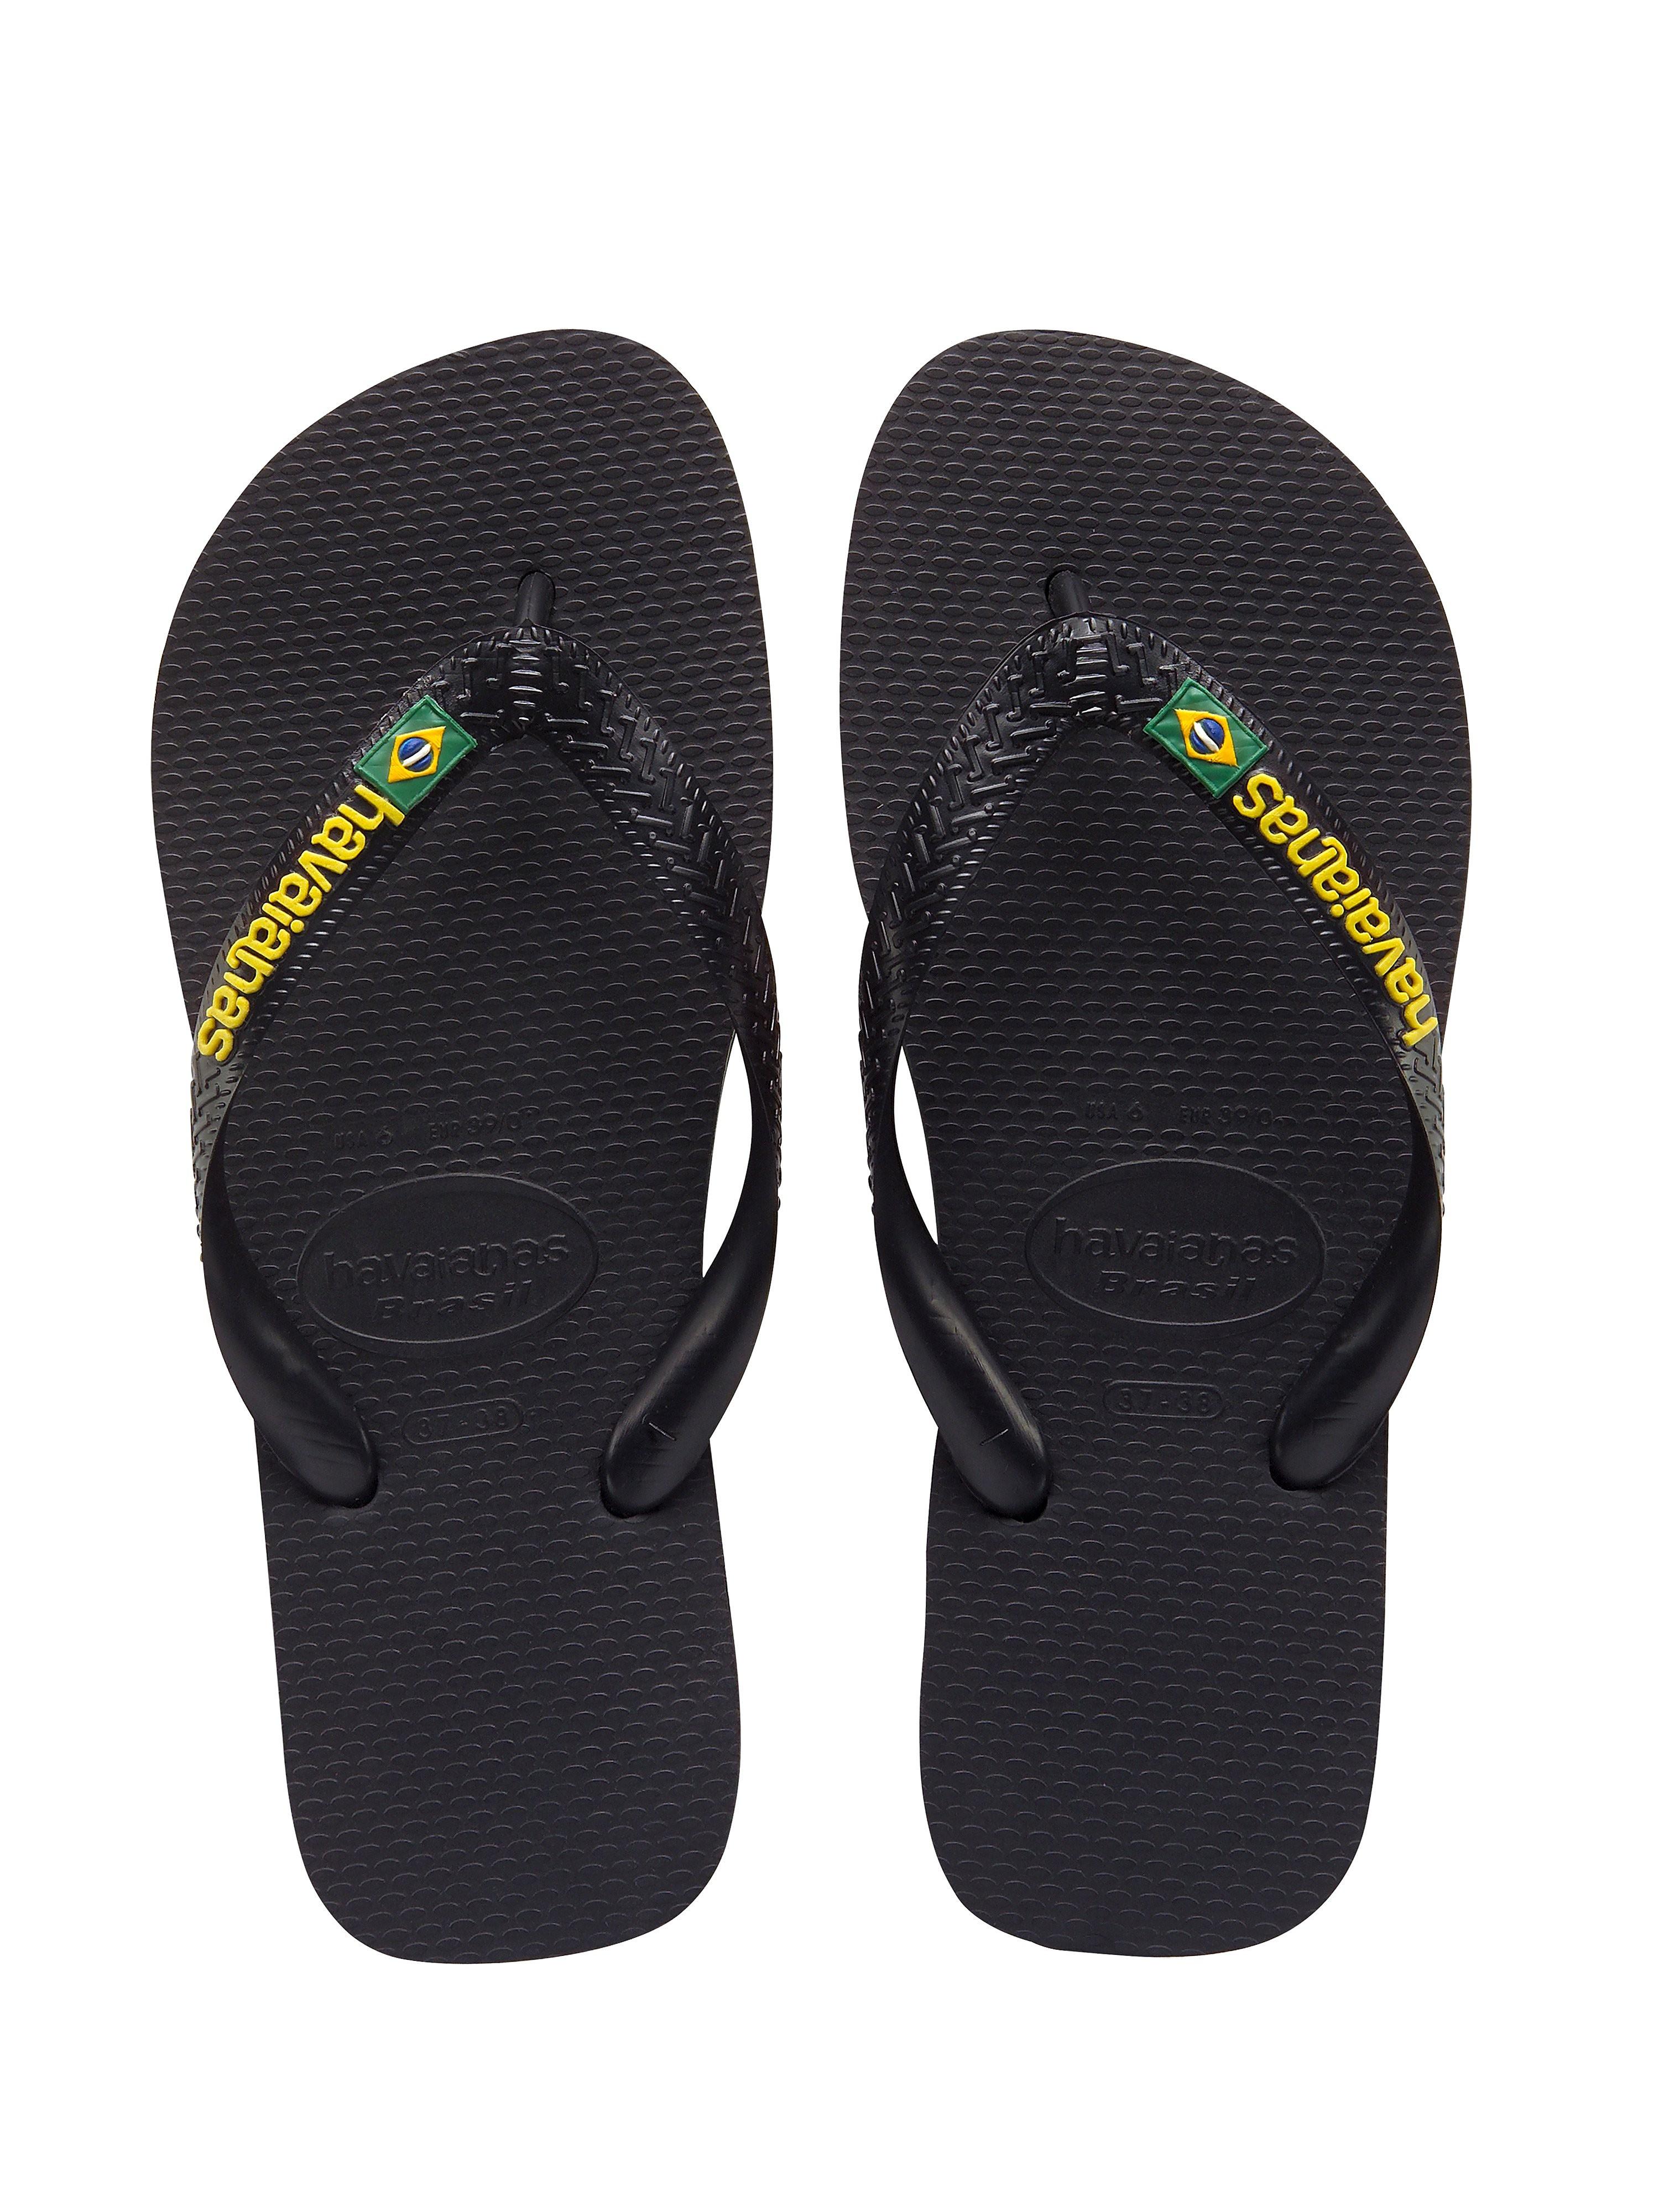 Havaianas Men's Brazil Logo Tonal Strap Flip Flops - Black